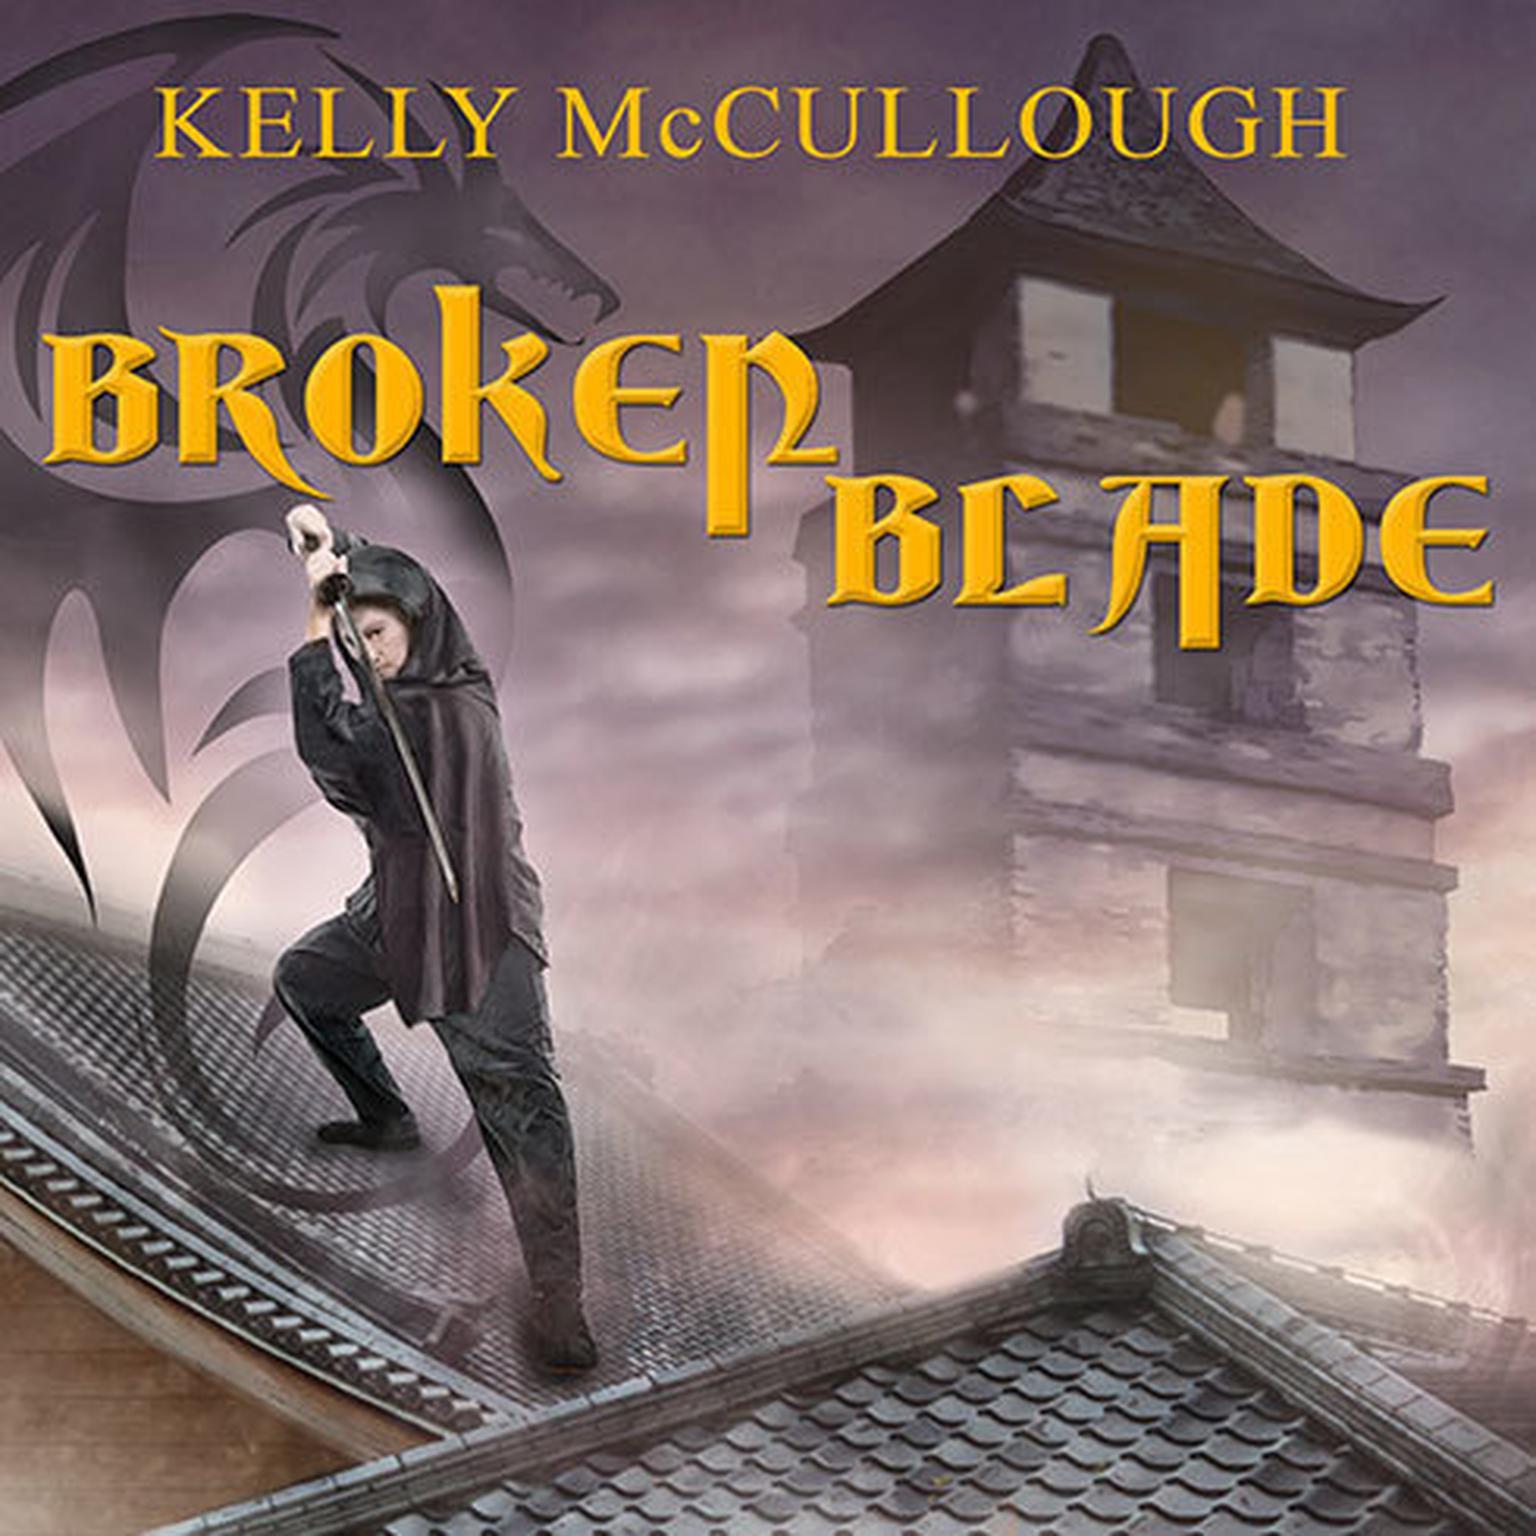 Printable Broken Blade Audiobook Cover Art